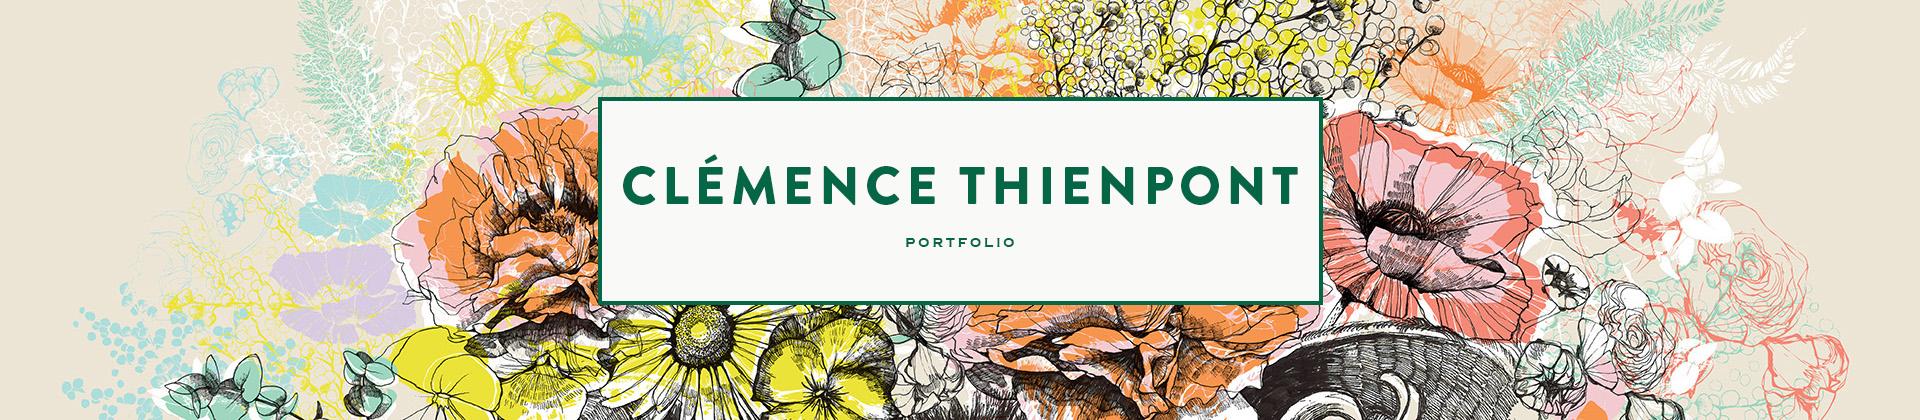 Clémence Thienpont